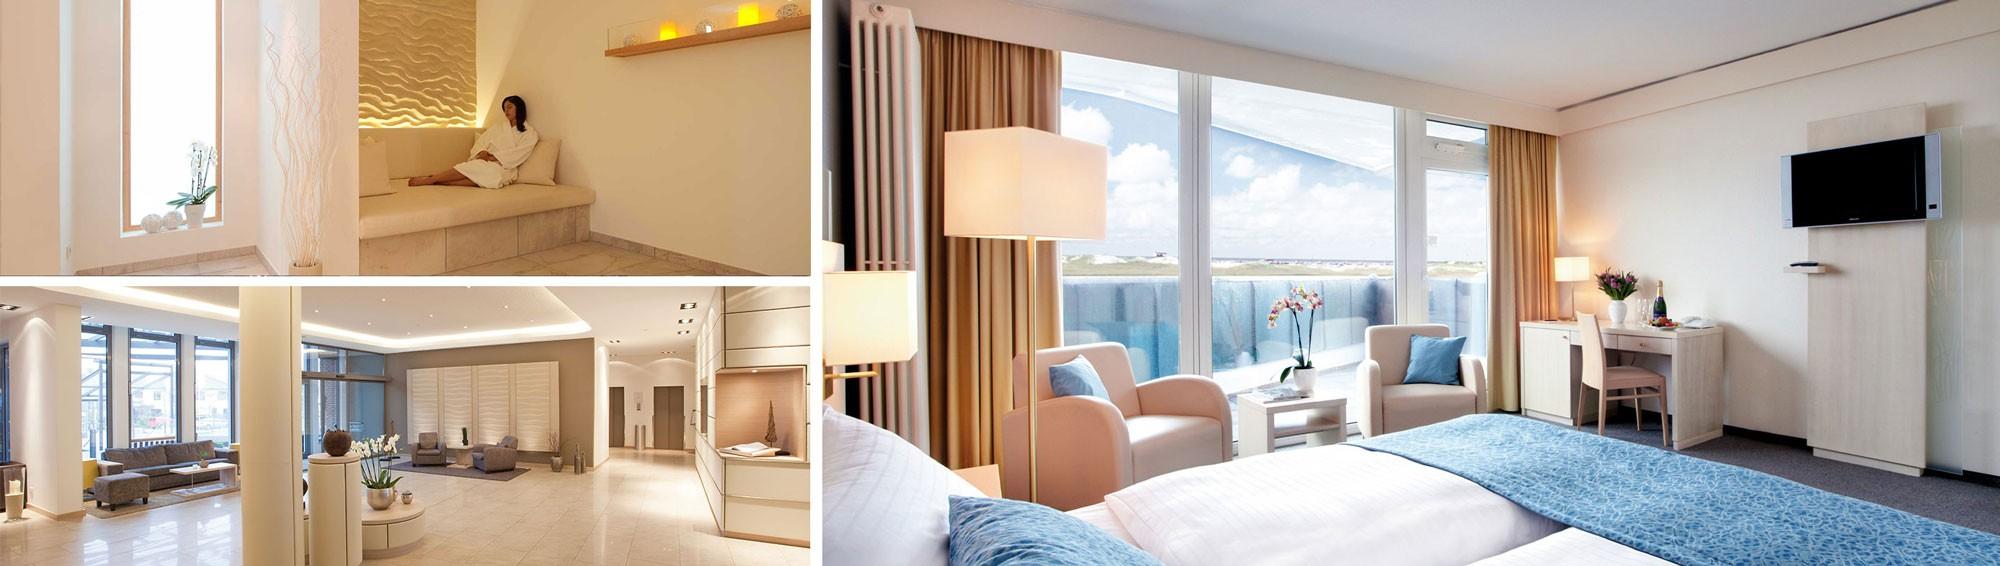 ambassador hotel & spa Rohwedel